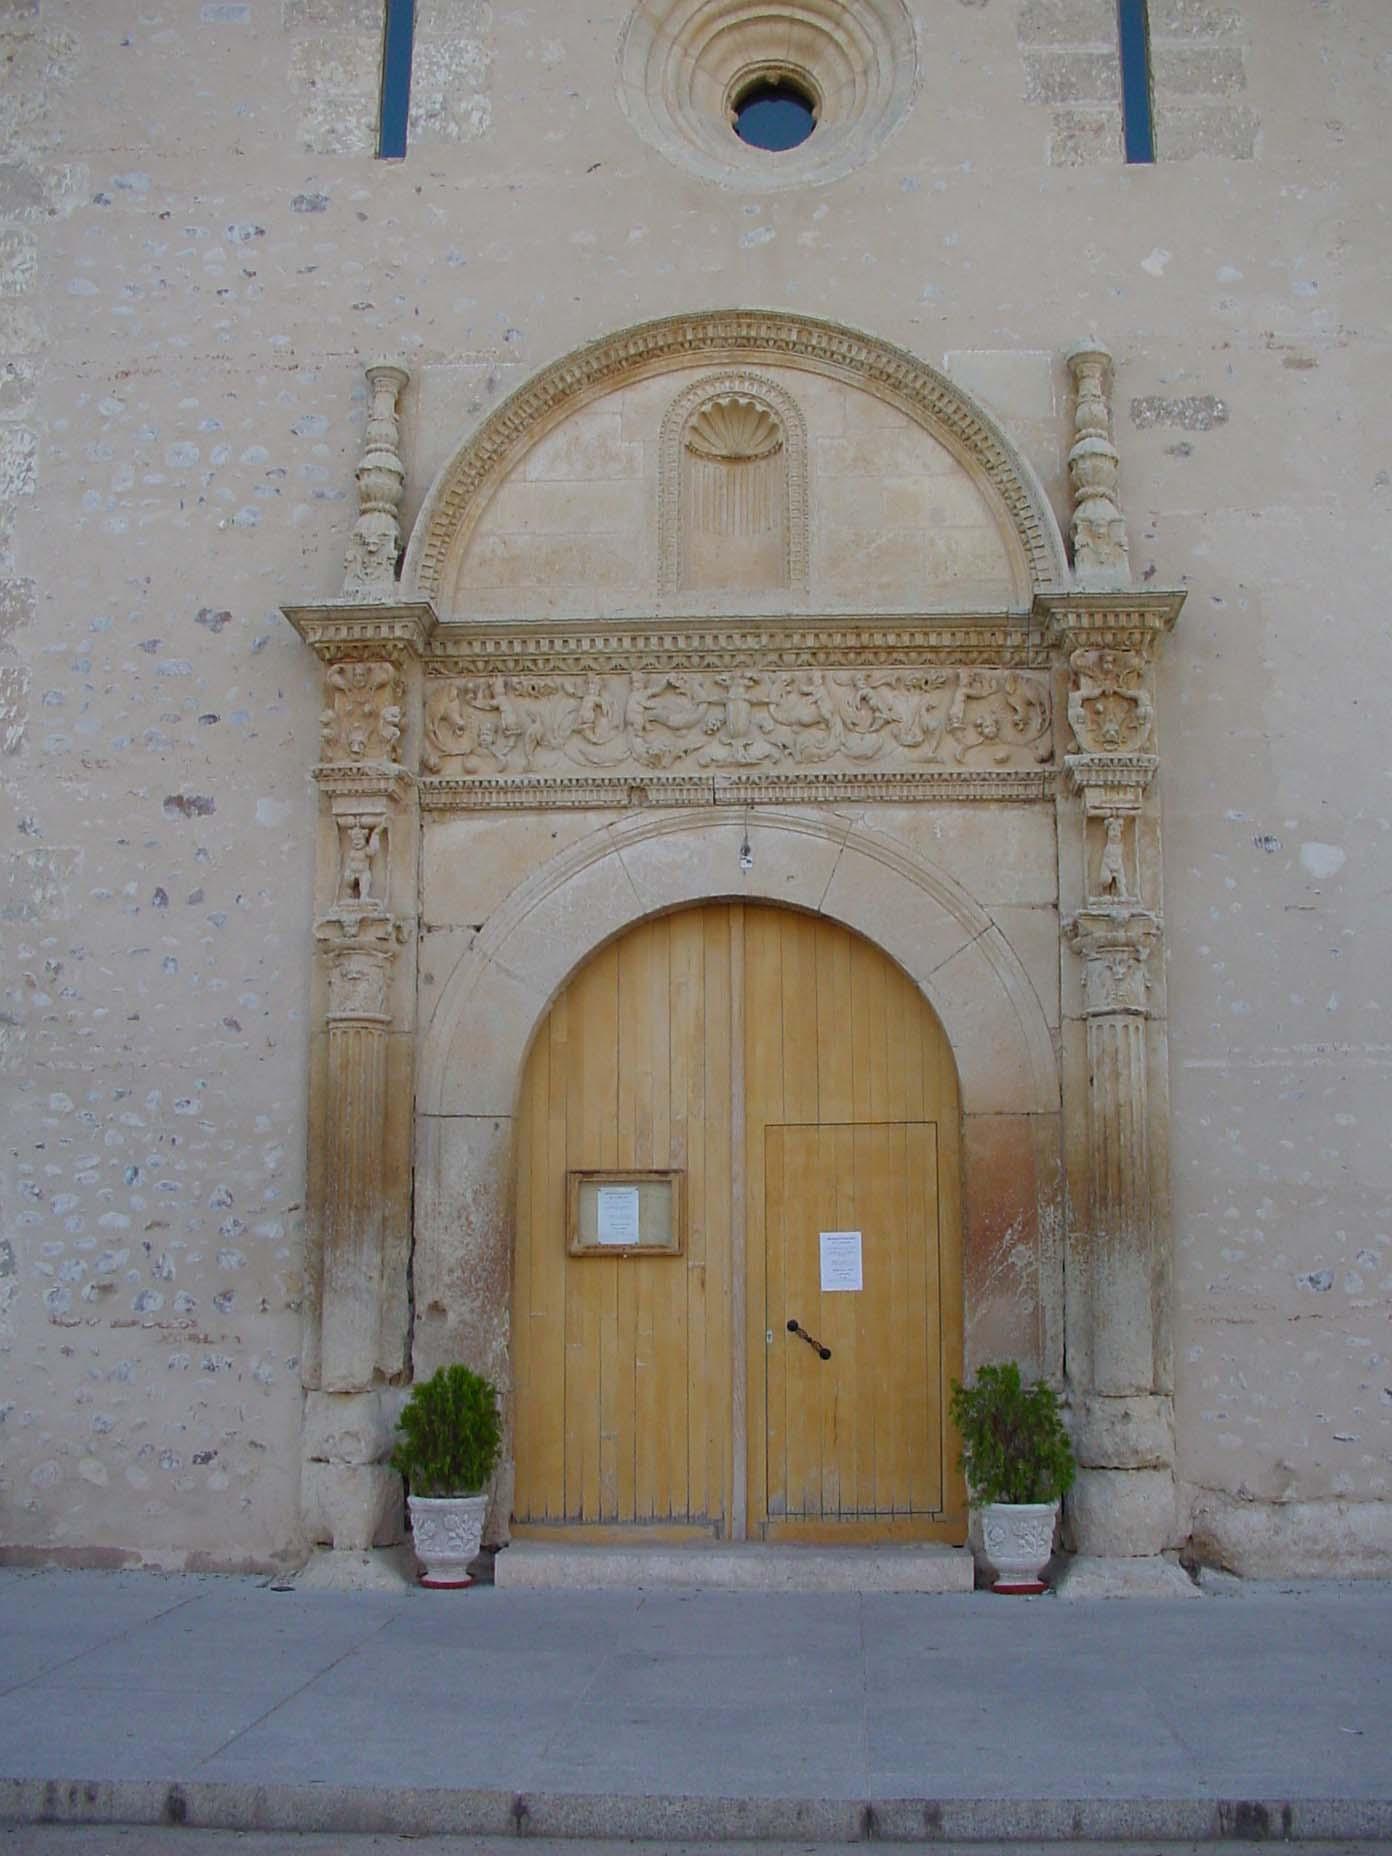 Puerta de iglesia en Valdetorres del Jarama